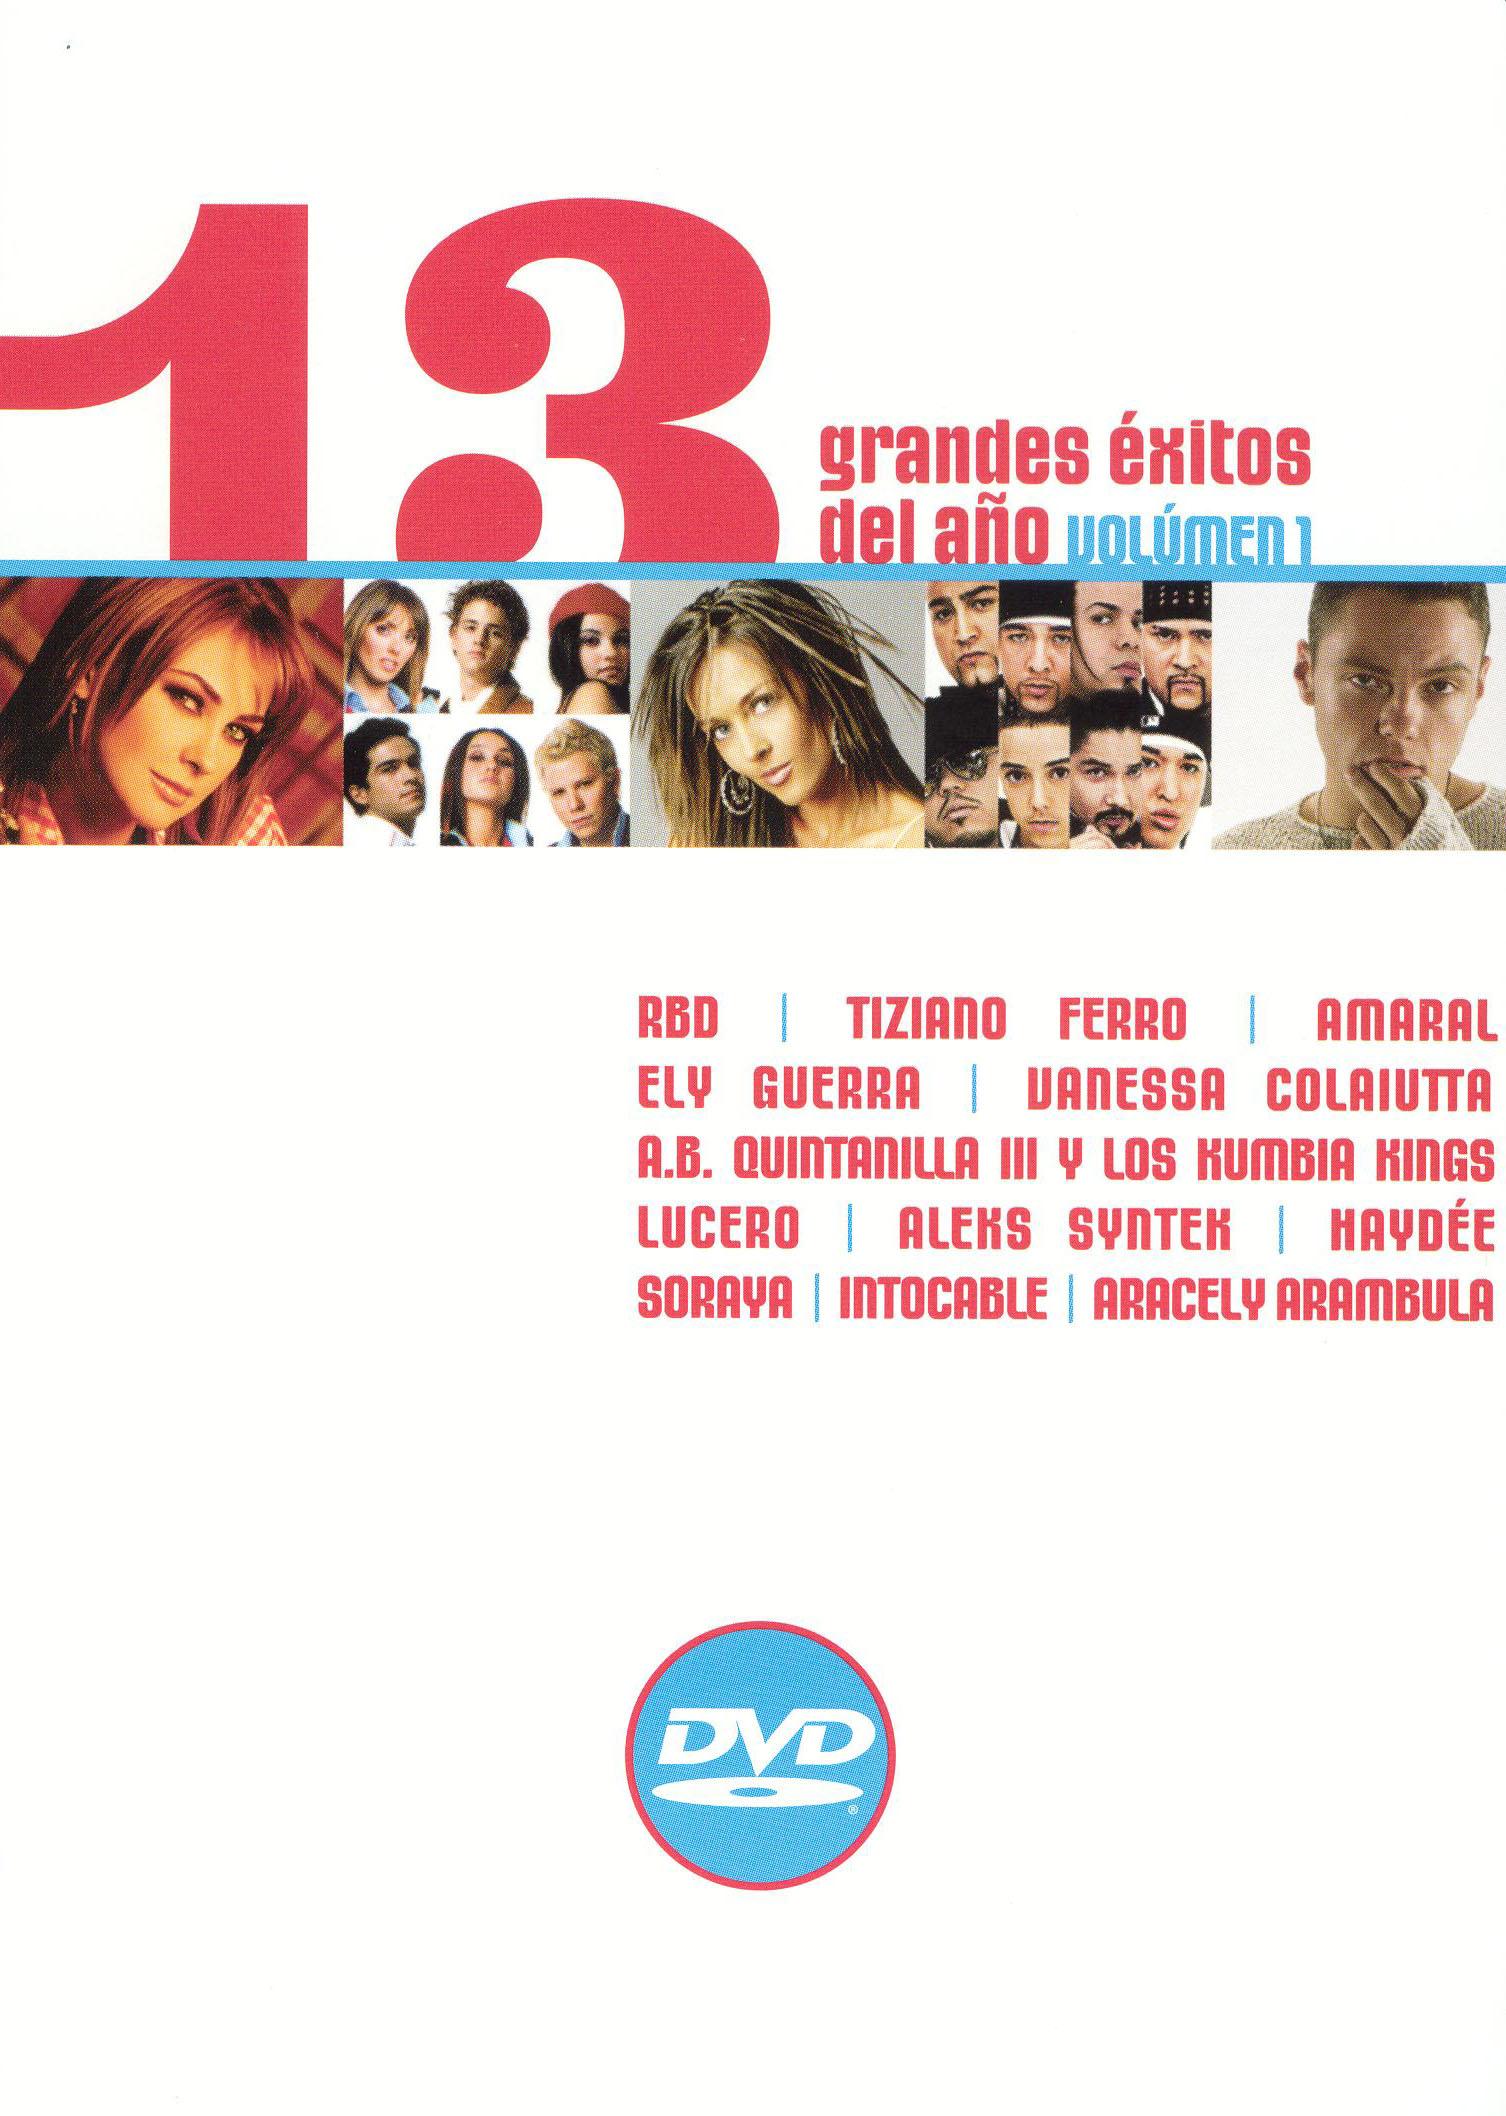 Thirteen Grandes Exitos del Ano, Vol. 1